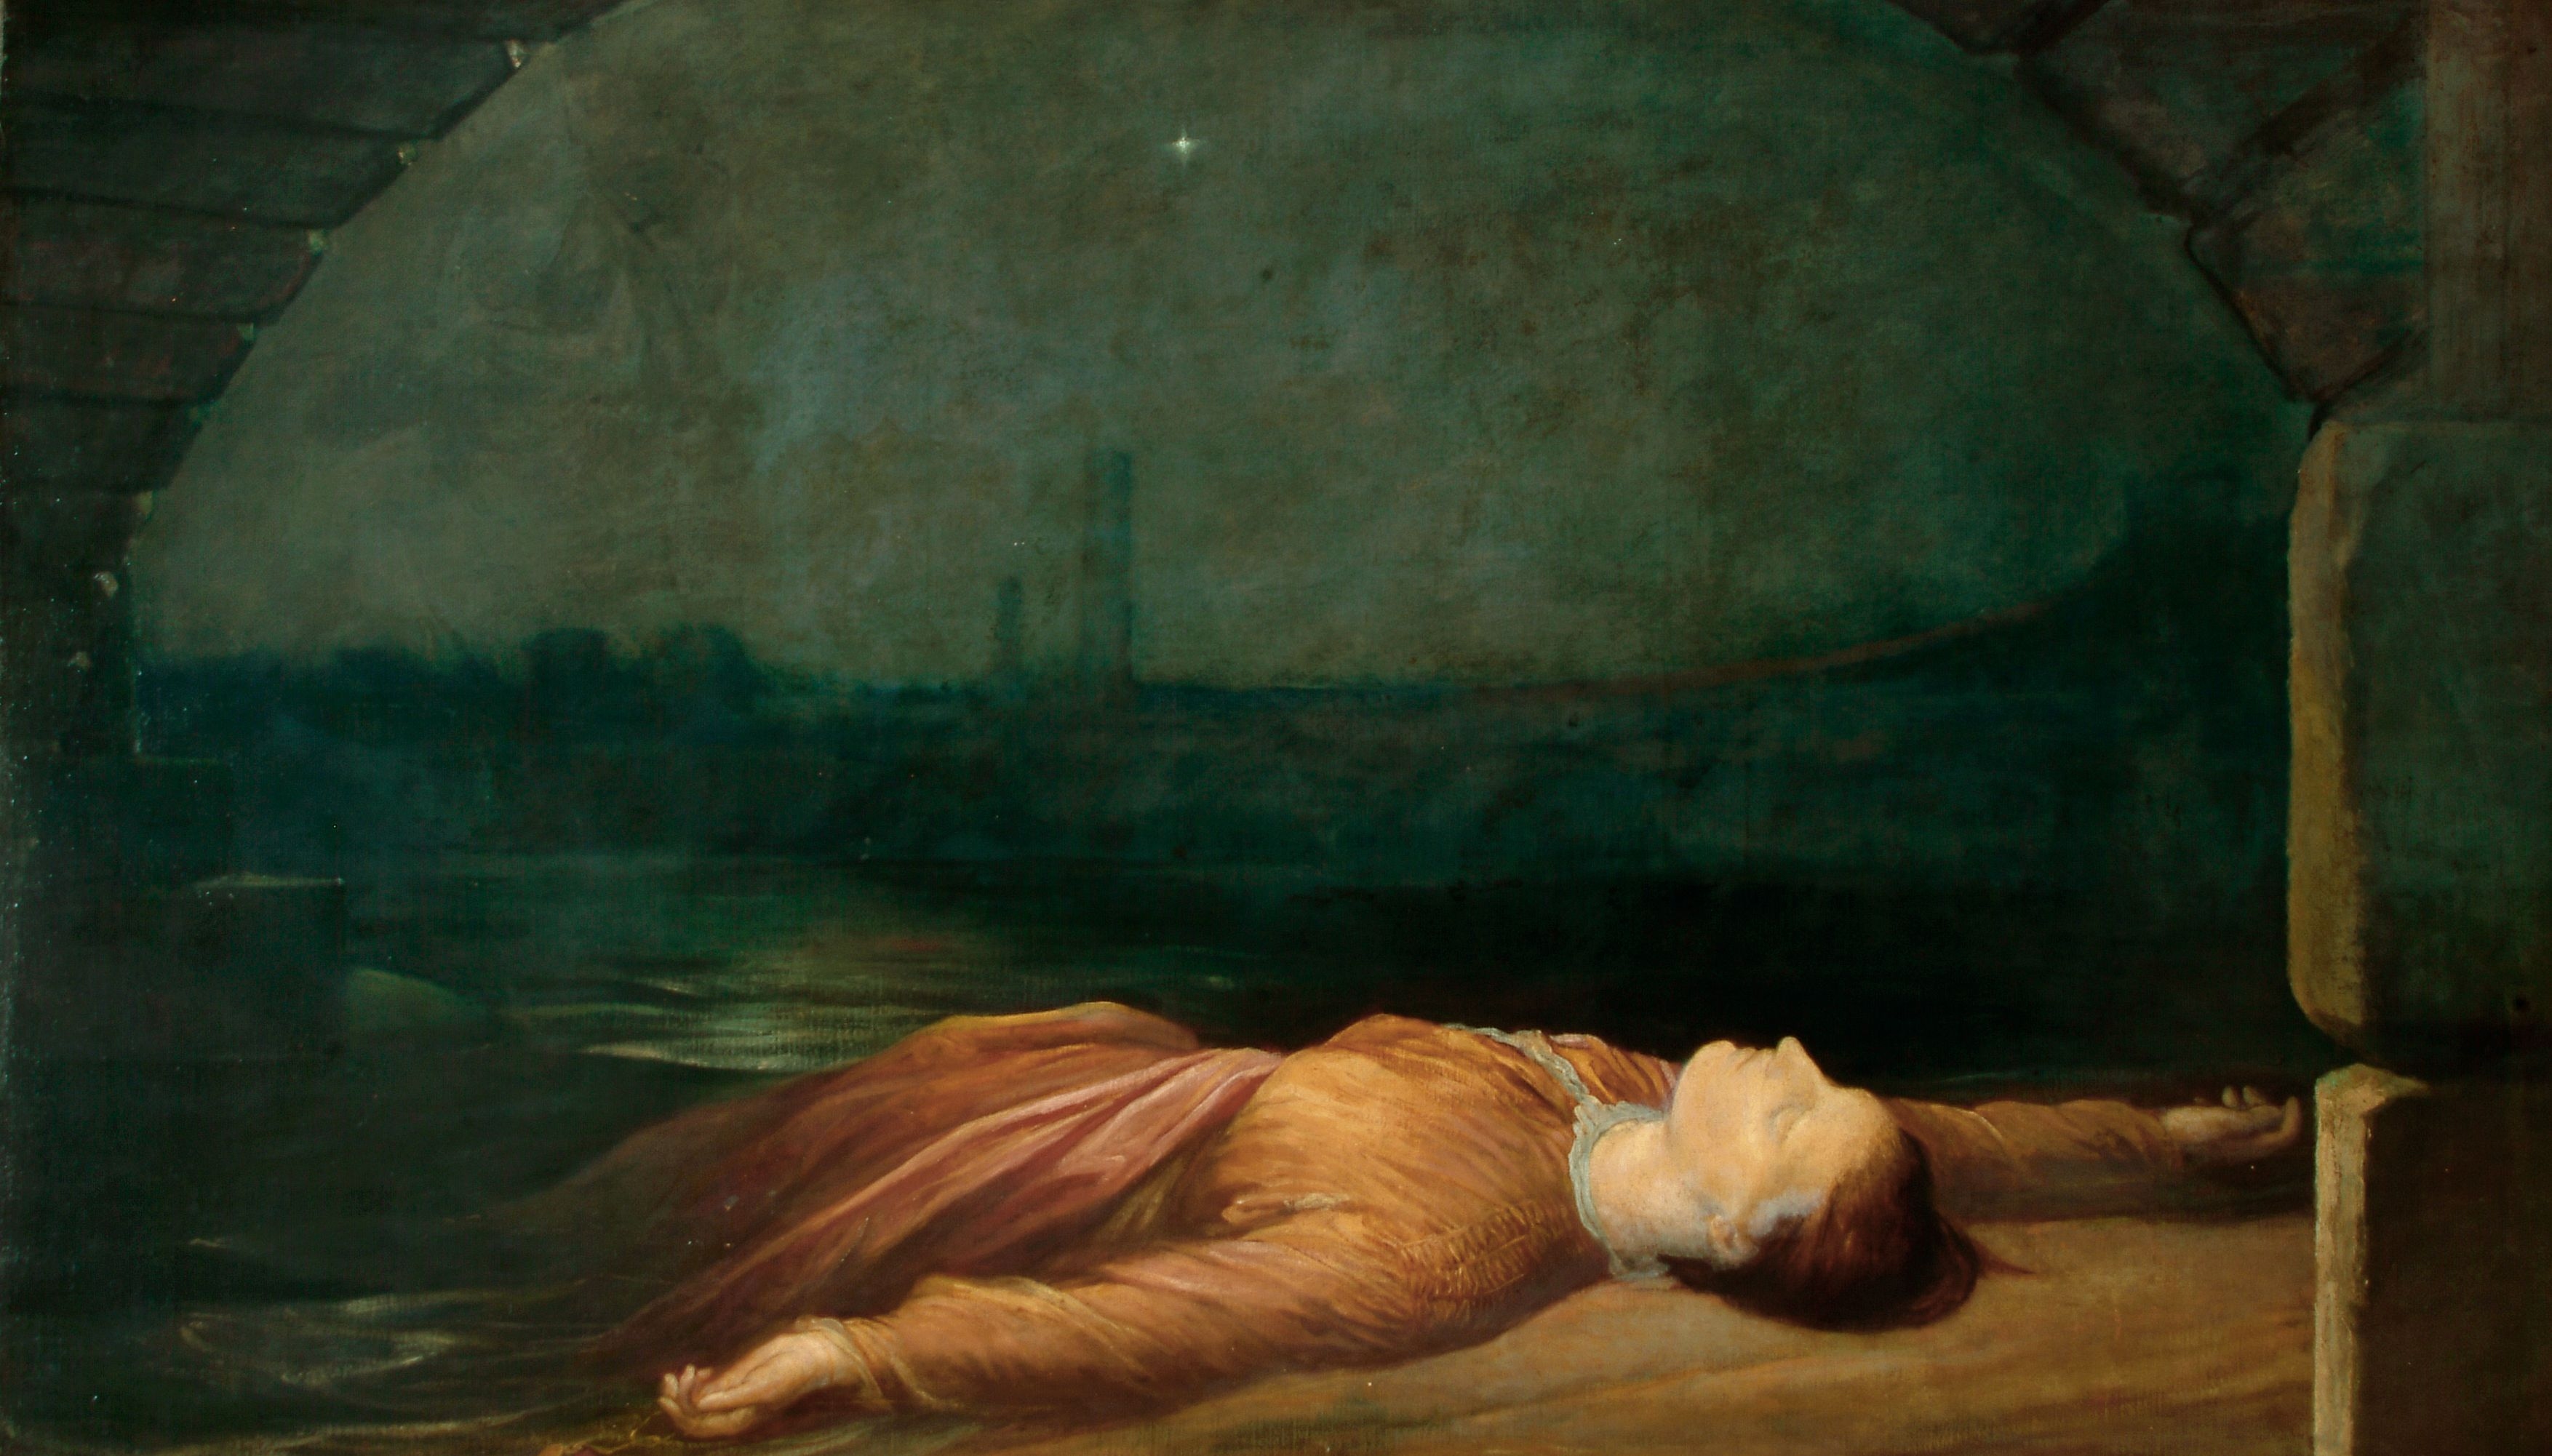 Bestand:George Frederick Watts Found Drowned.jpg